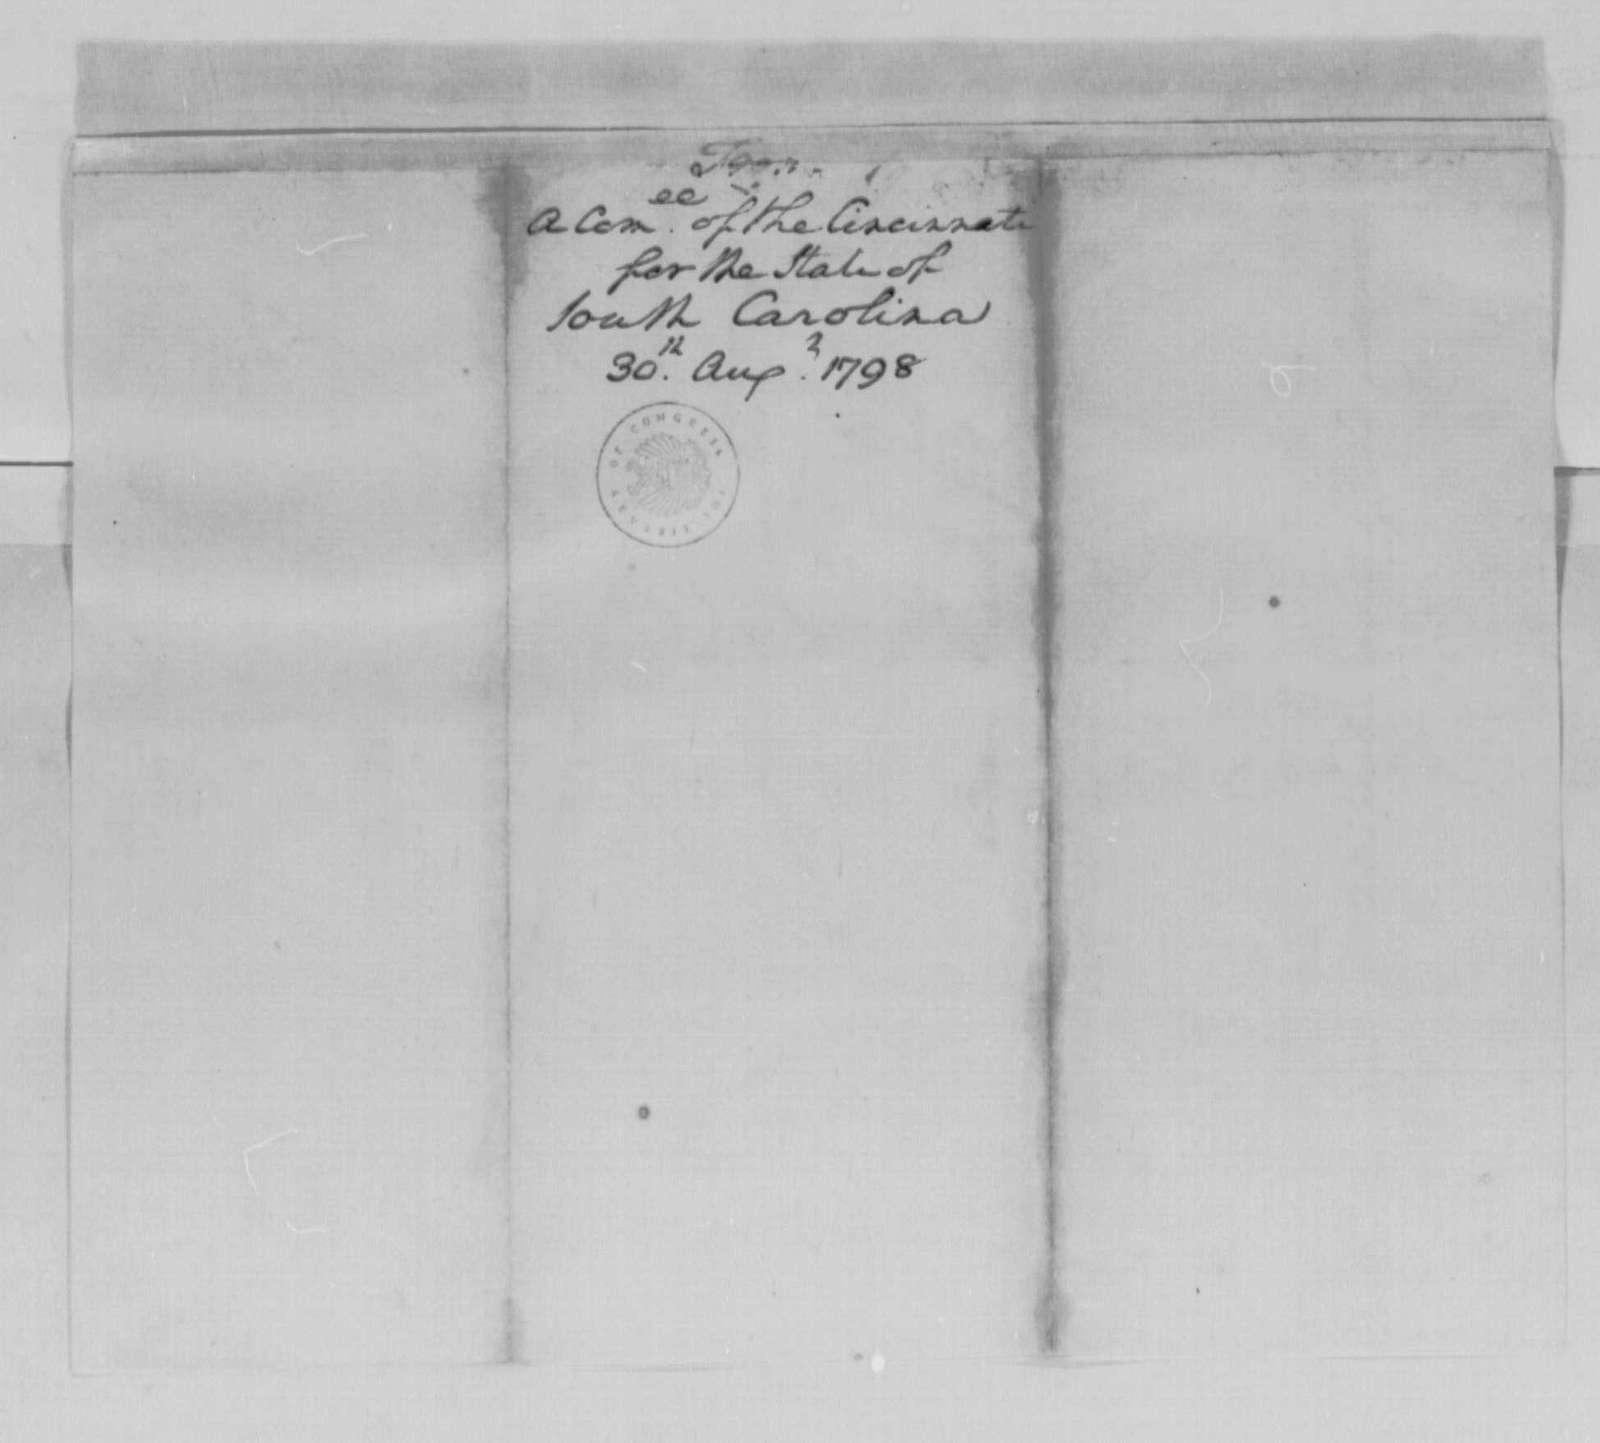 George Washington Papers, Series 4, General Correspondence: Society of the Cincinnati of South Carolina (John F. Grimke, Thomas Pinckney, and Adam Gilchrist) to George Washington, August 30, 1798